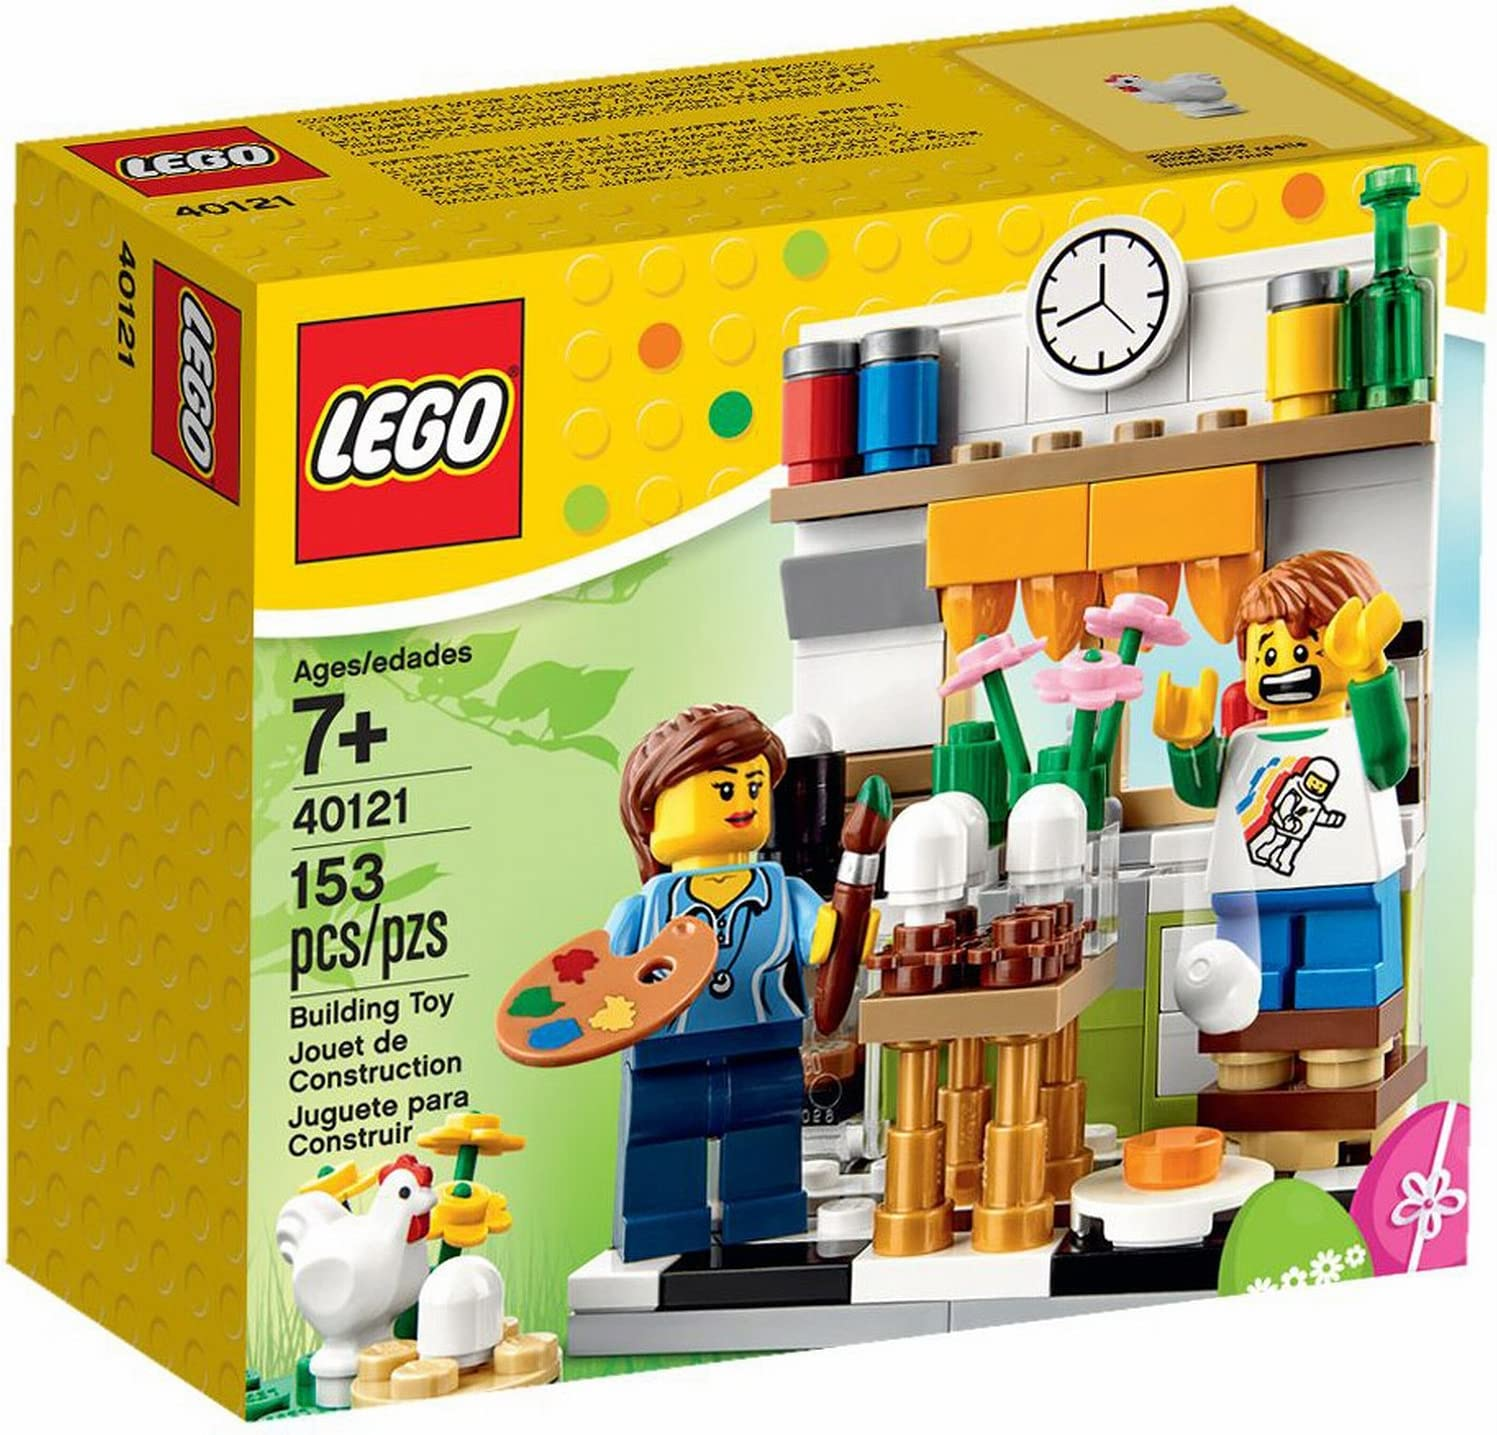 LEGO Painting Easter Eggs Painting Easter Eggs Set 40121